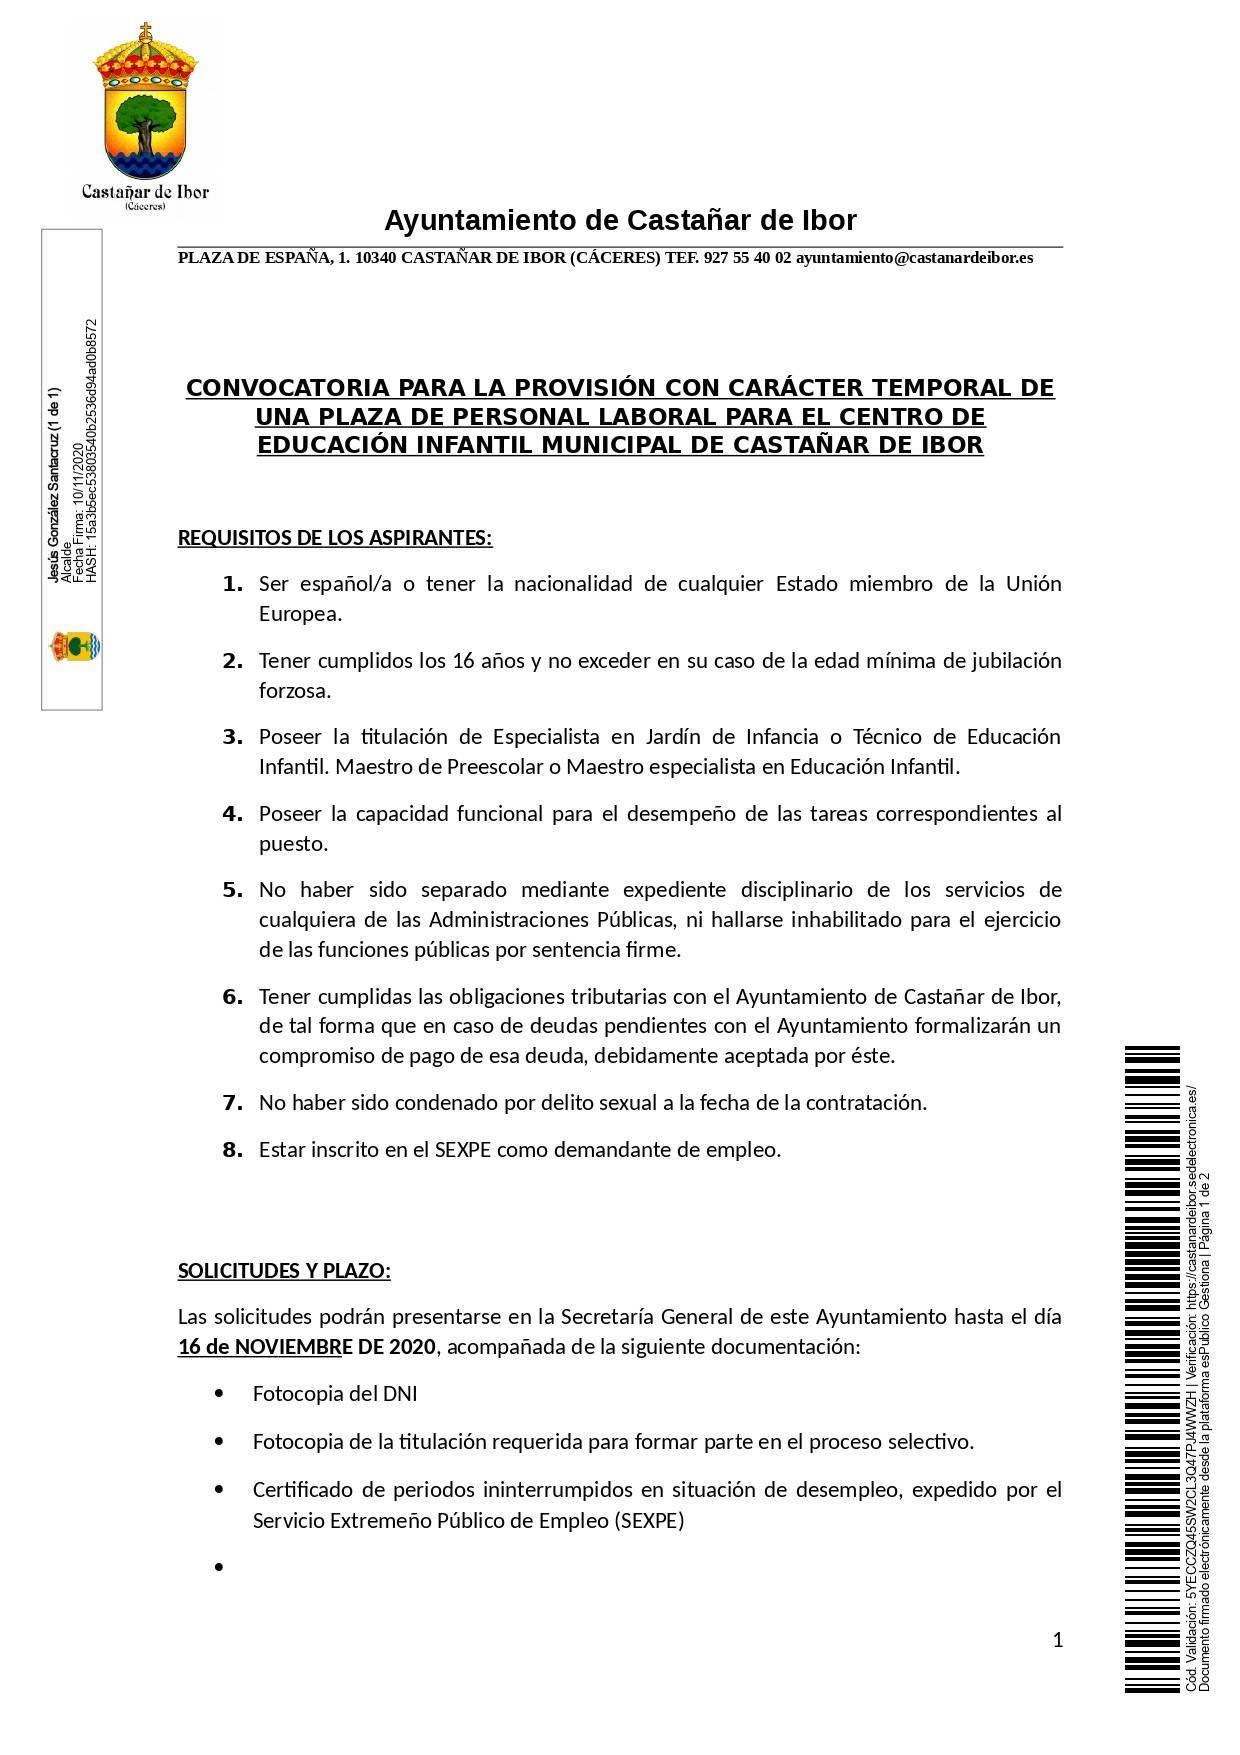 Maestro especialista en educación infantil (2020) - Castañar de Ibor (Cáceres) 1